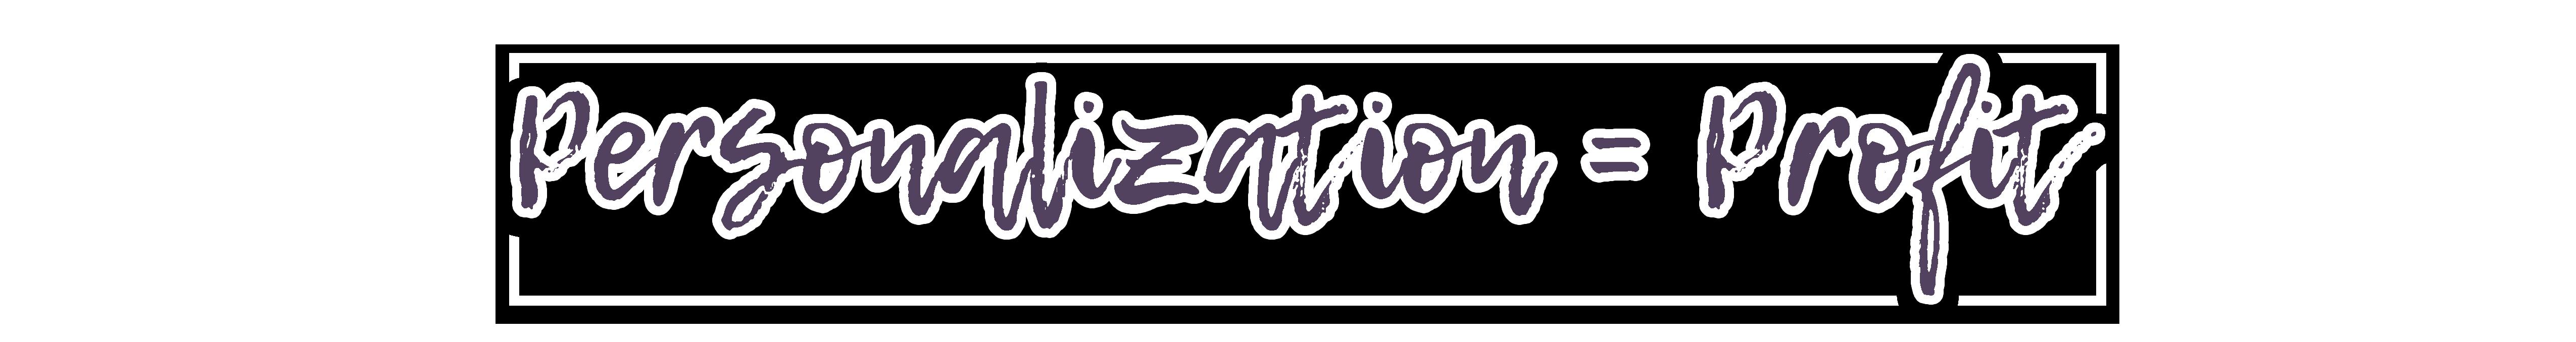 personalization-profit.png